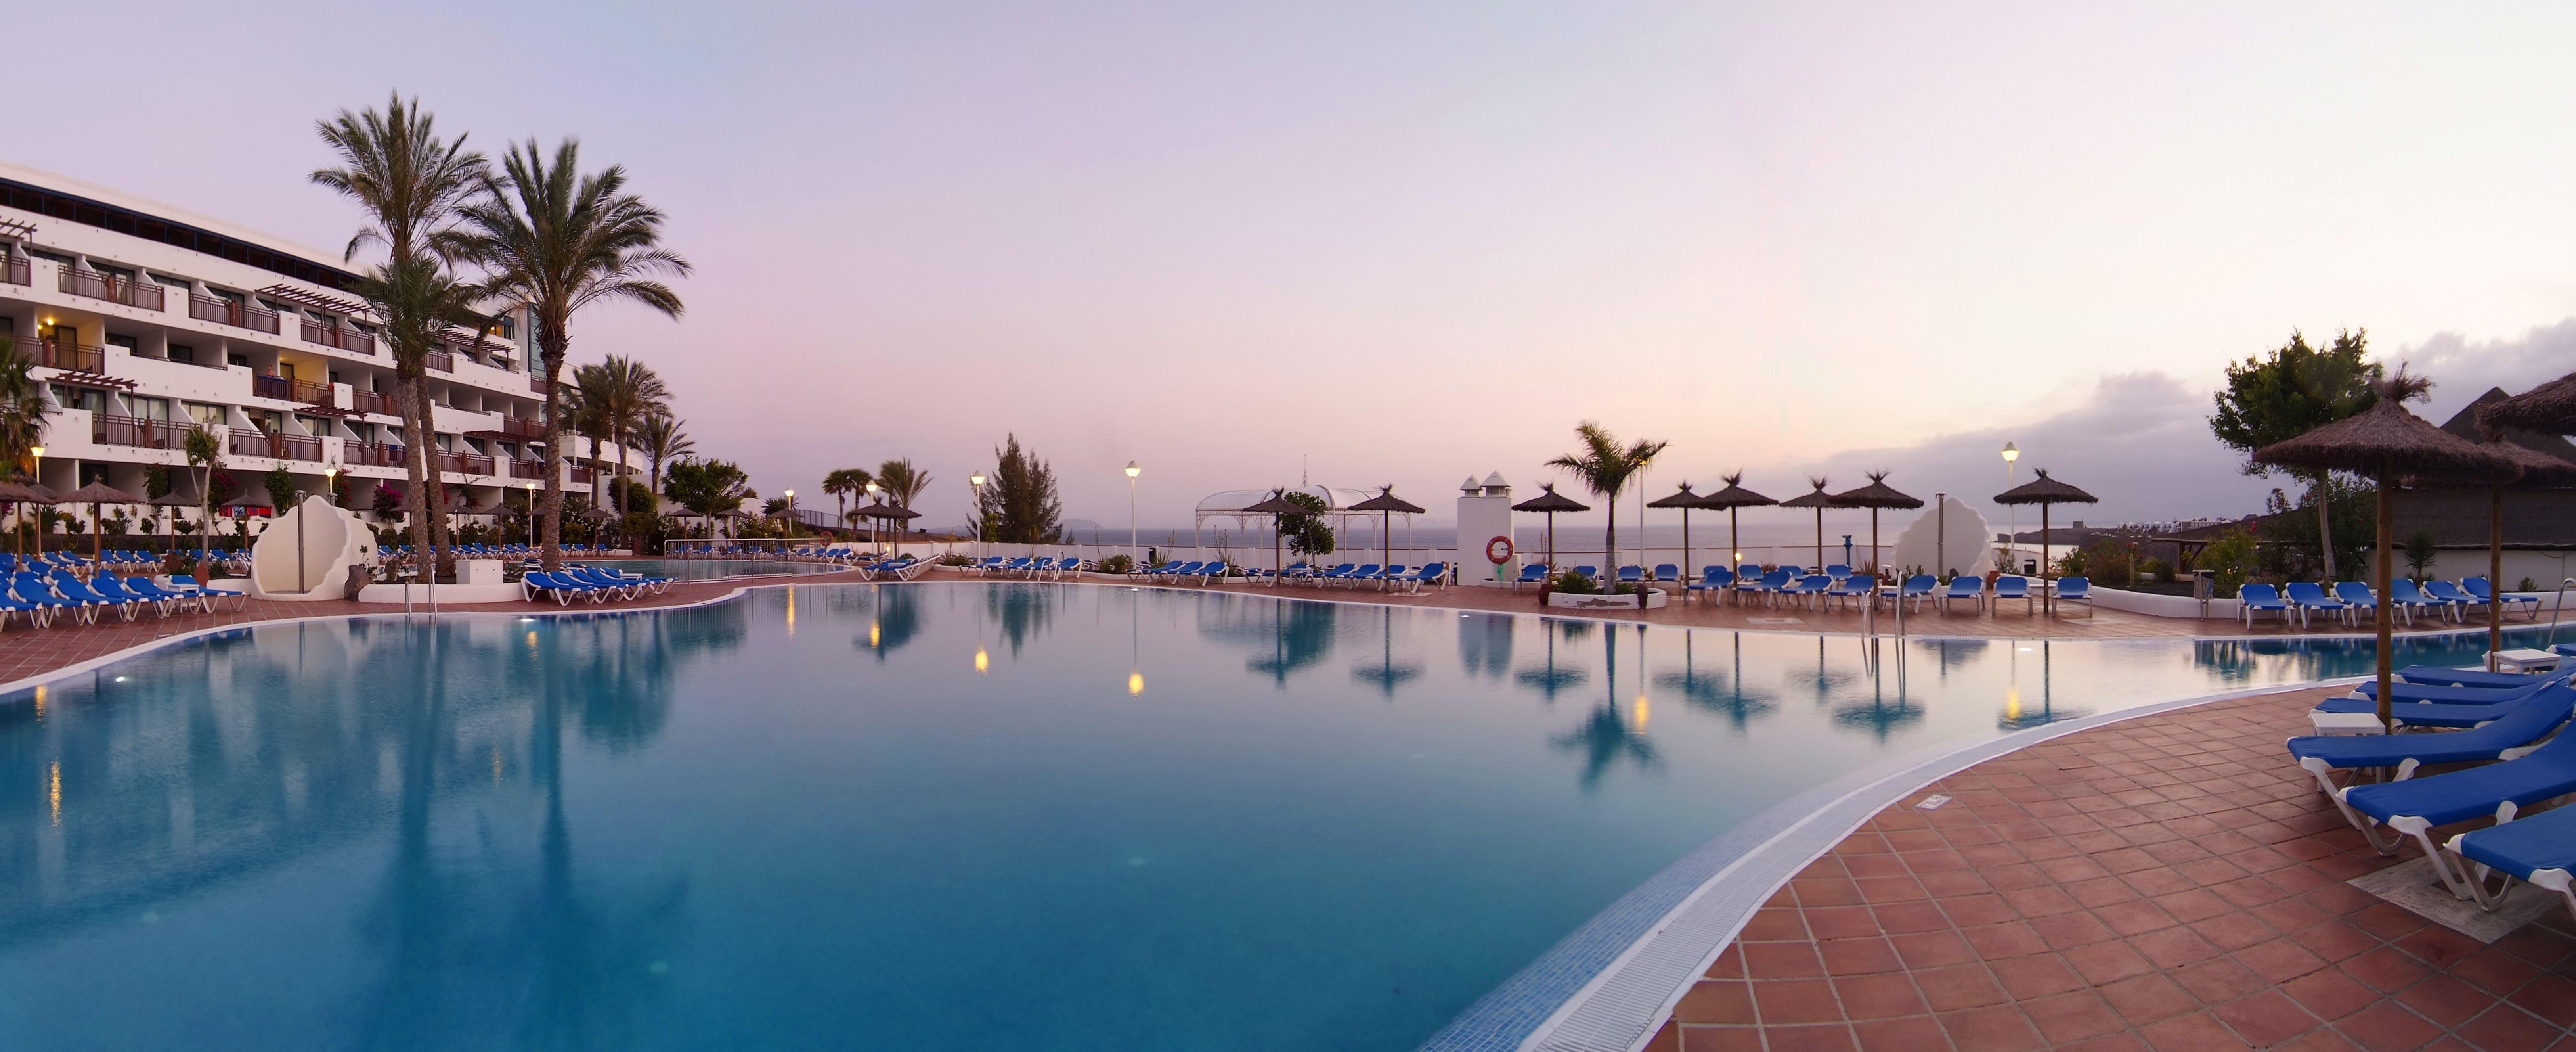 Hotell Sandos Papagayo Beach Resort, Playa Blanca Lanzarote